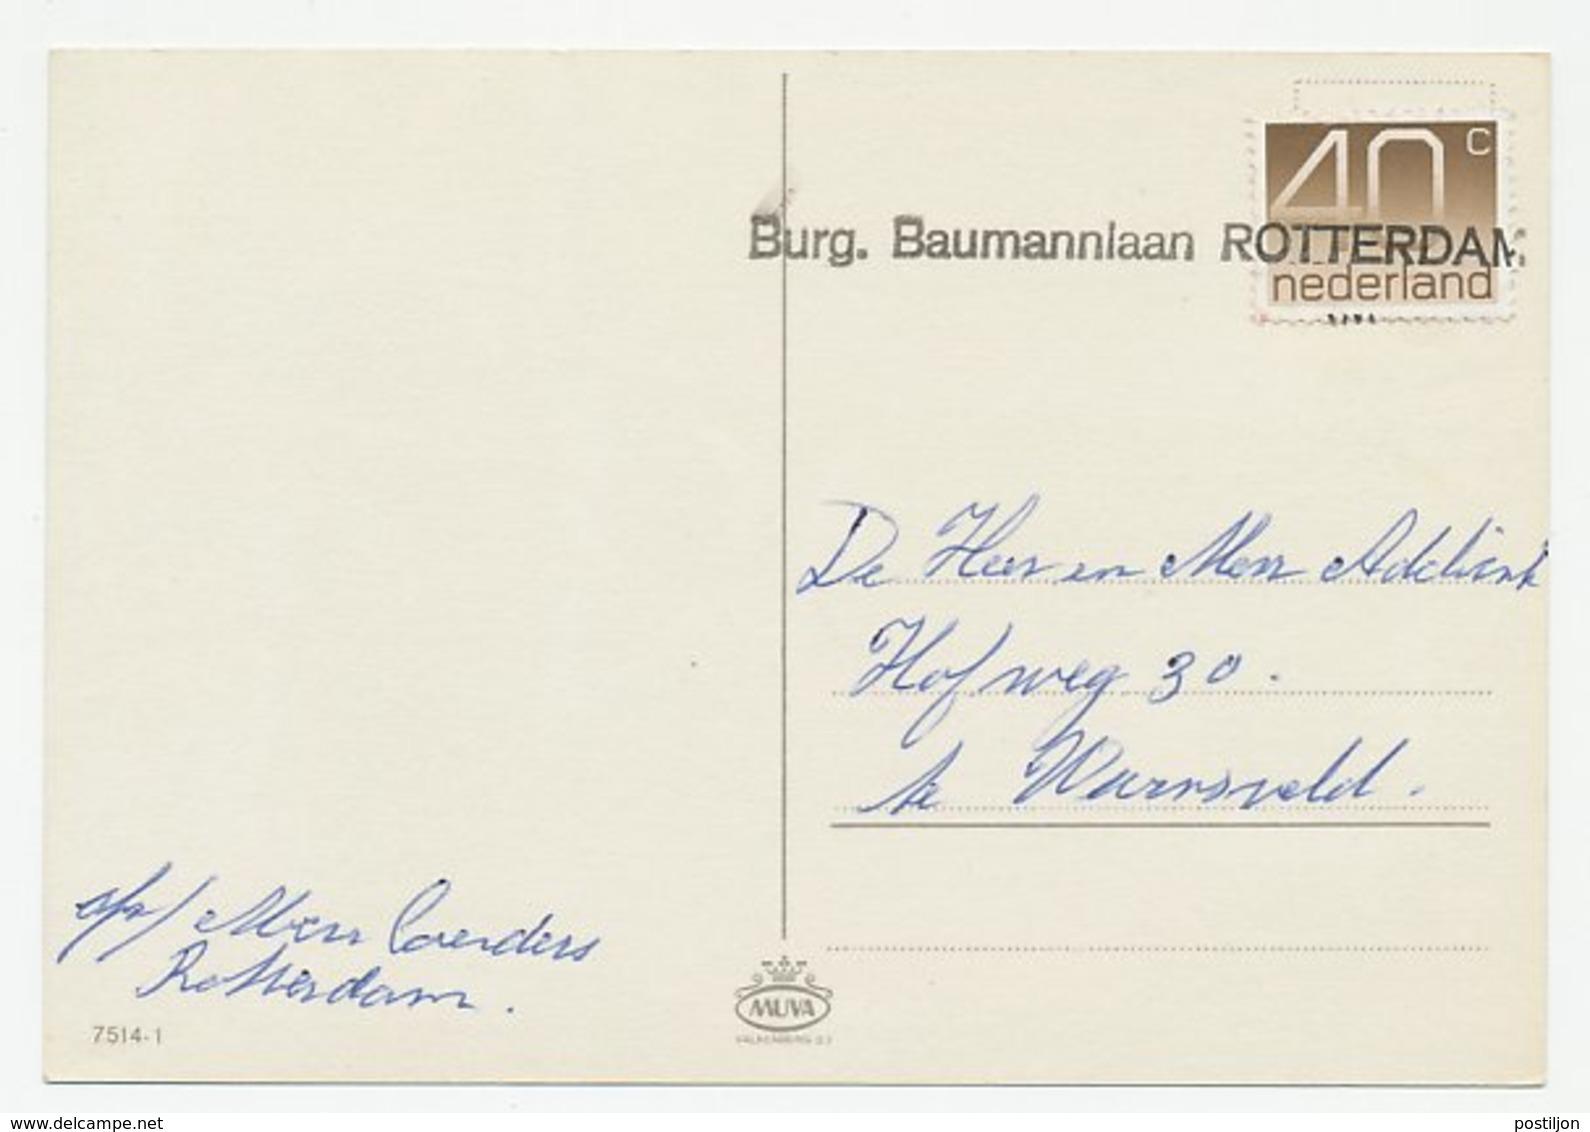 Nieuwjaarshandstempel : Burg. Baumannlaan Rotterdam - Periode 1949-1980 (Juliana)